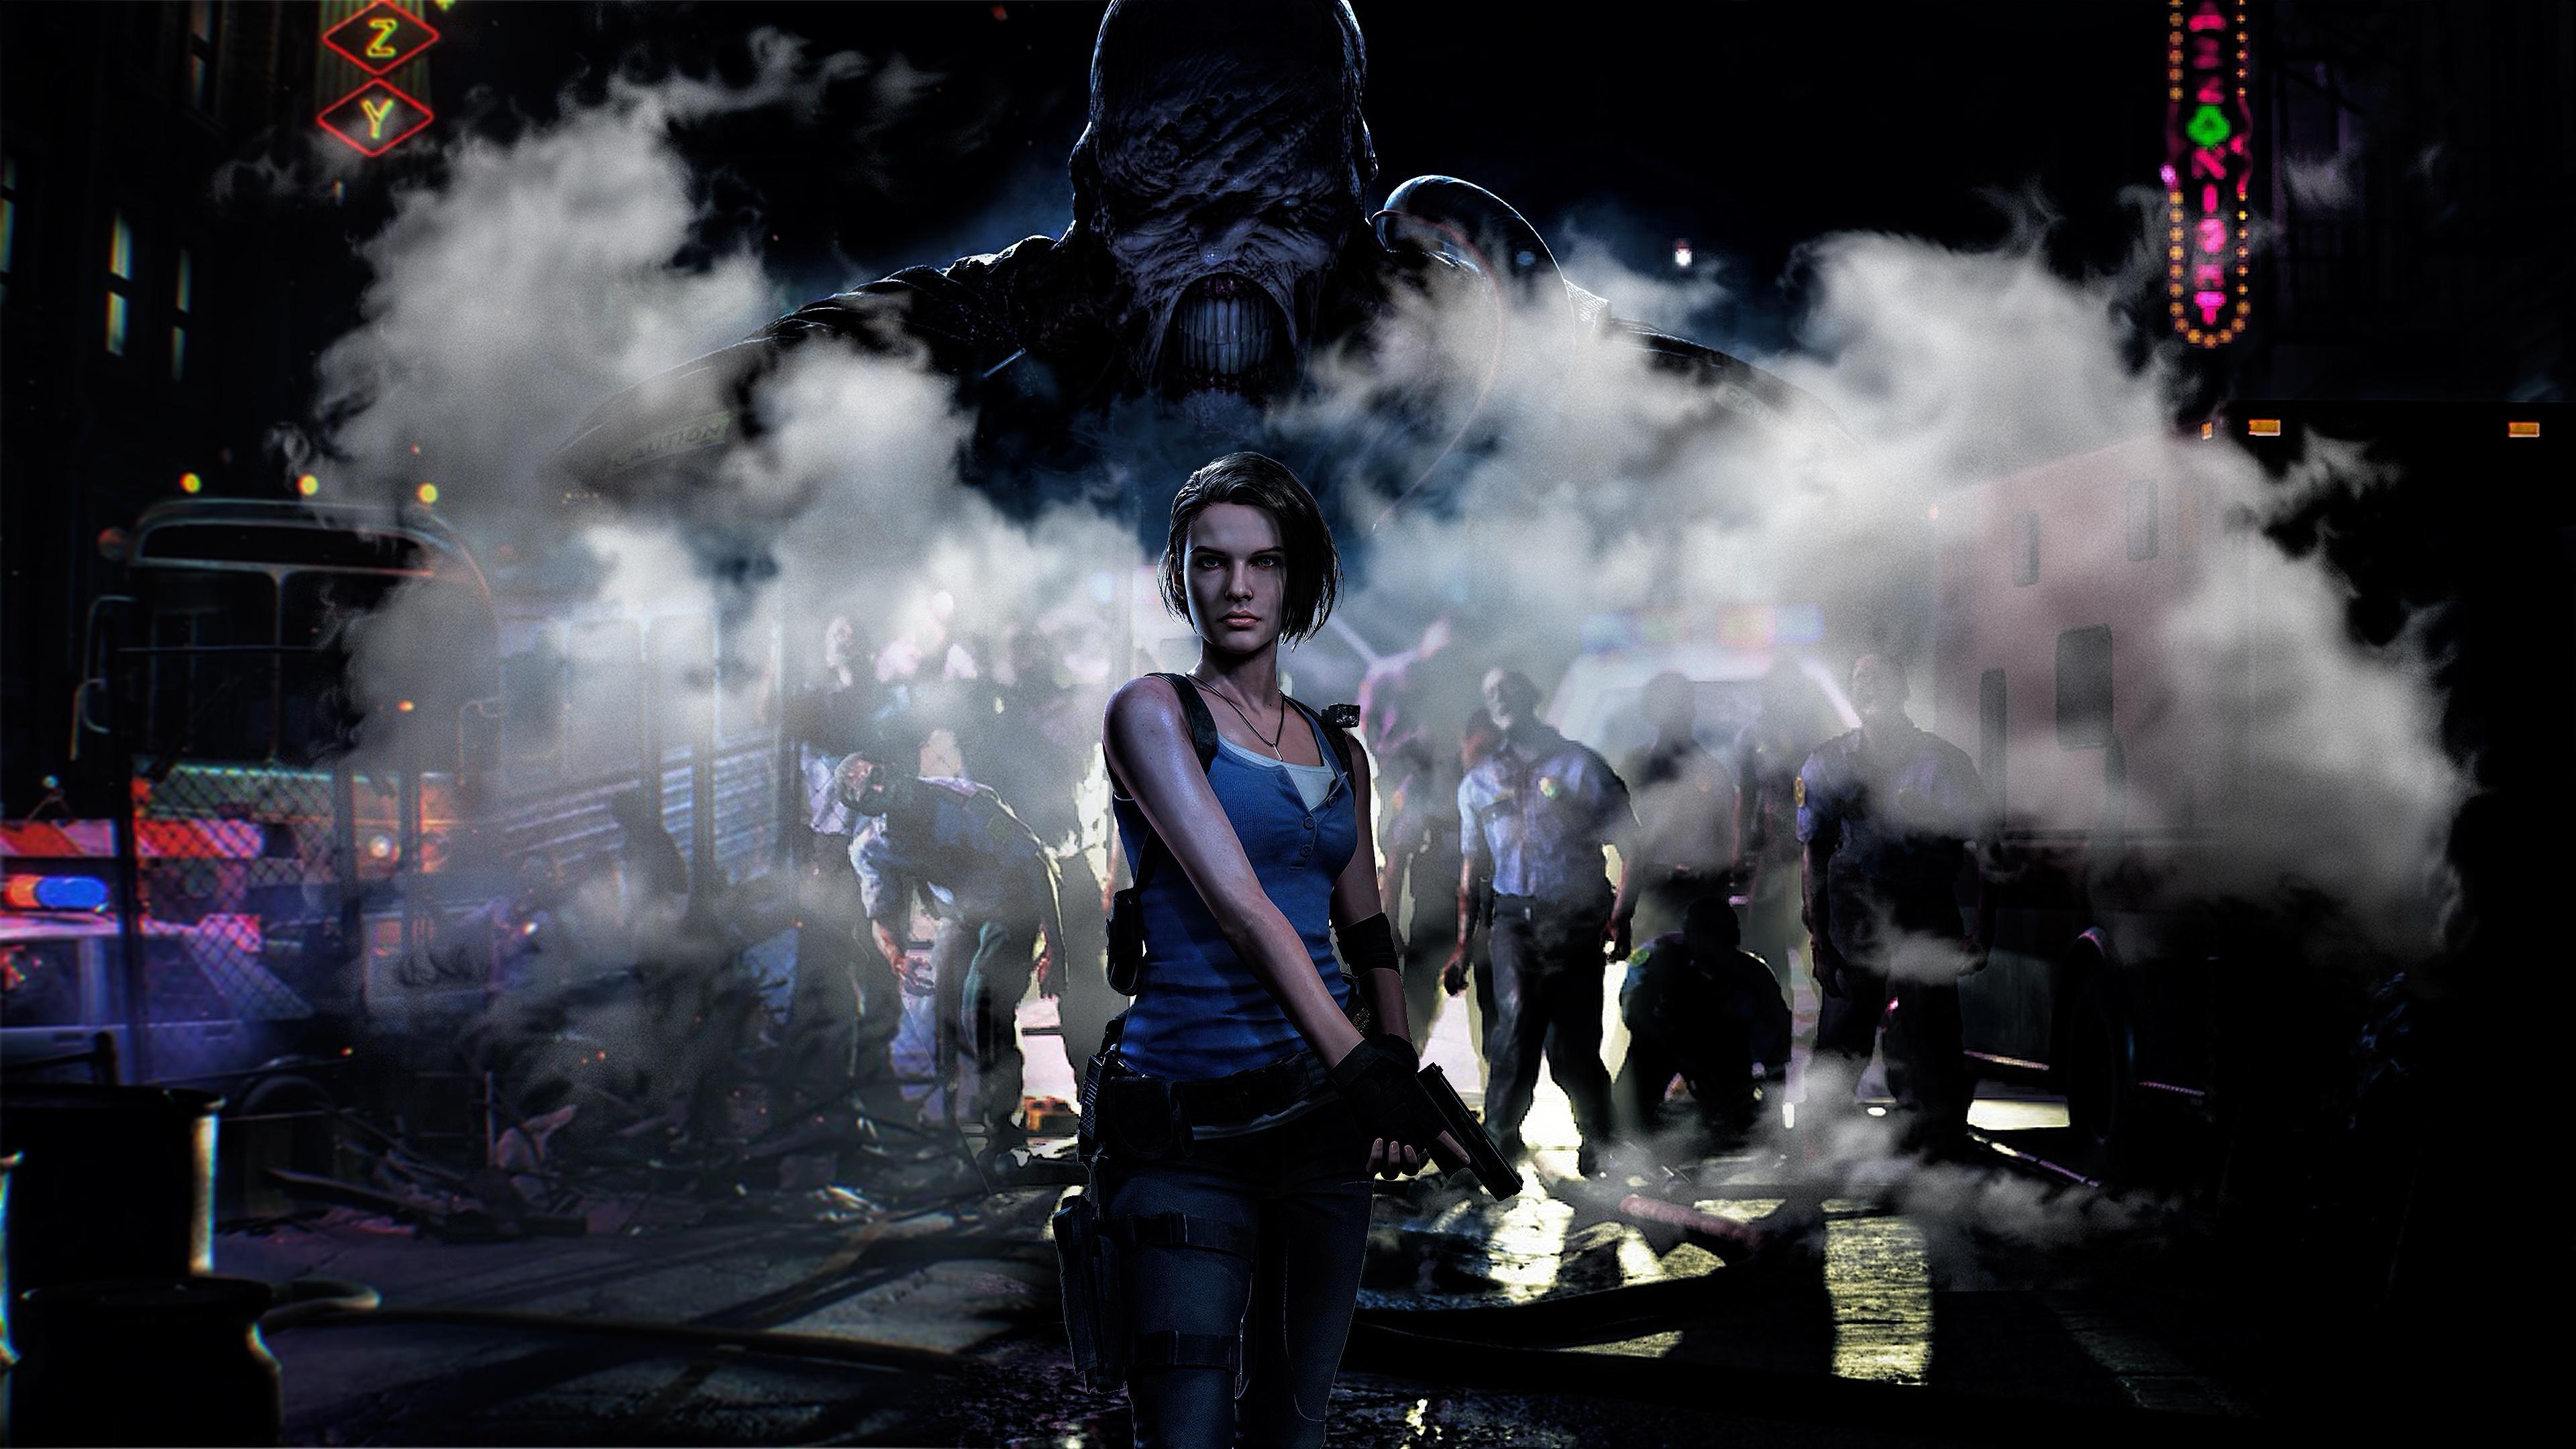 4k Jill Valentine Resident Evil 3 Wallpaper Hd Games 4k